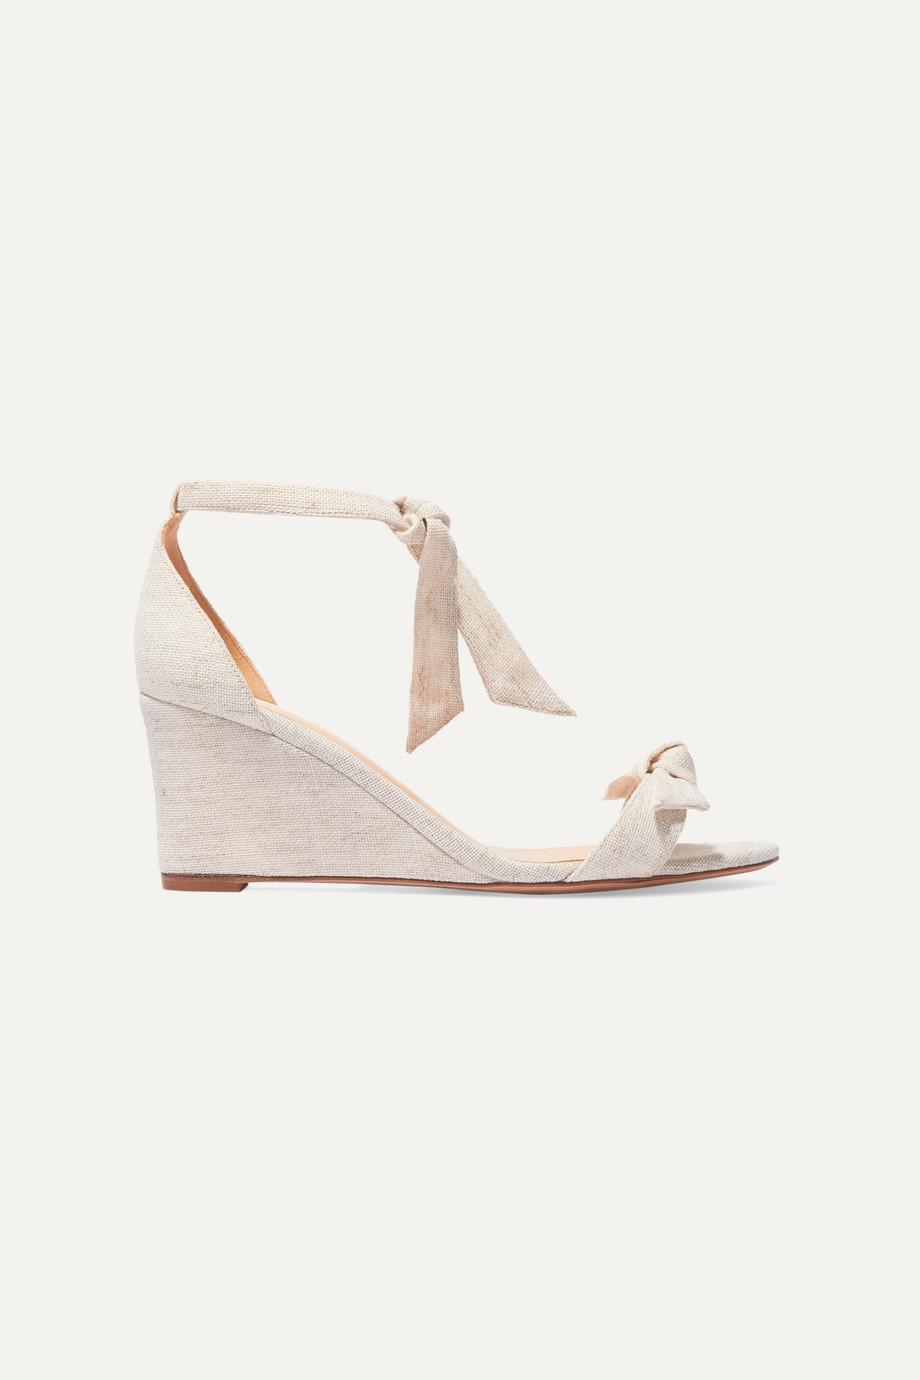 Alexandre Birman Clarita bow-embellished canvas espadrille wedge sandals